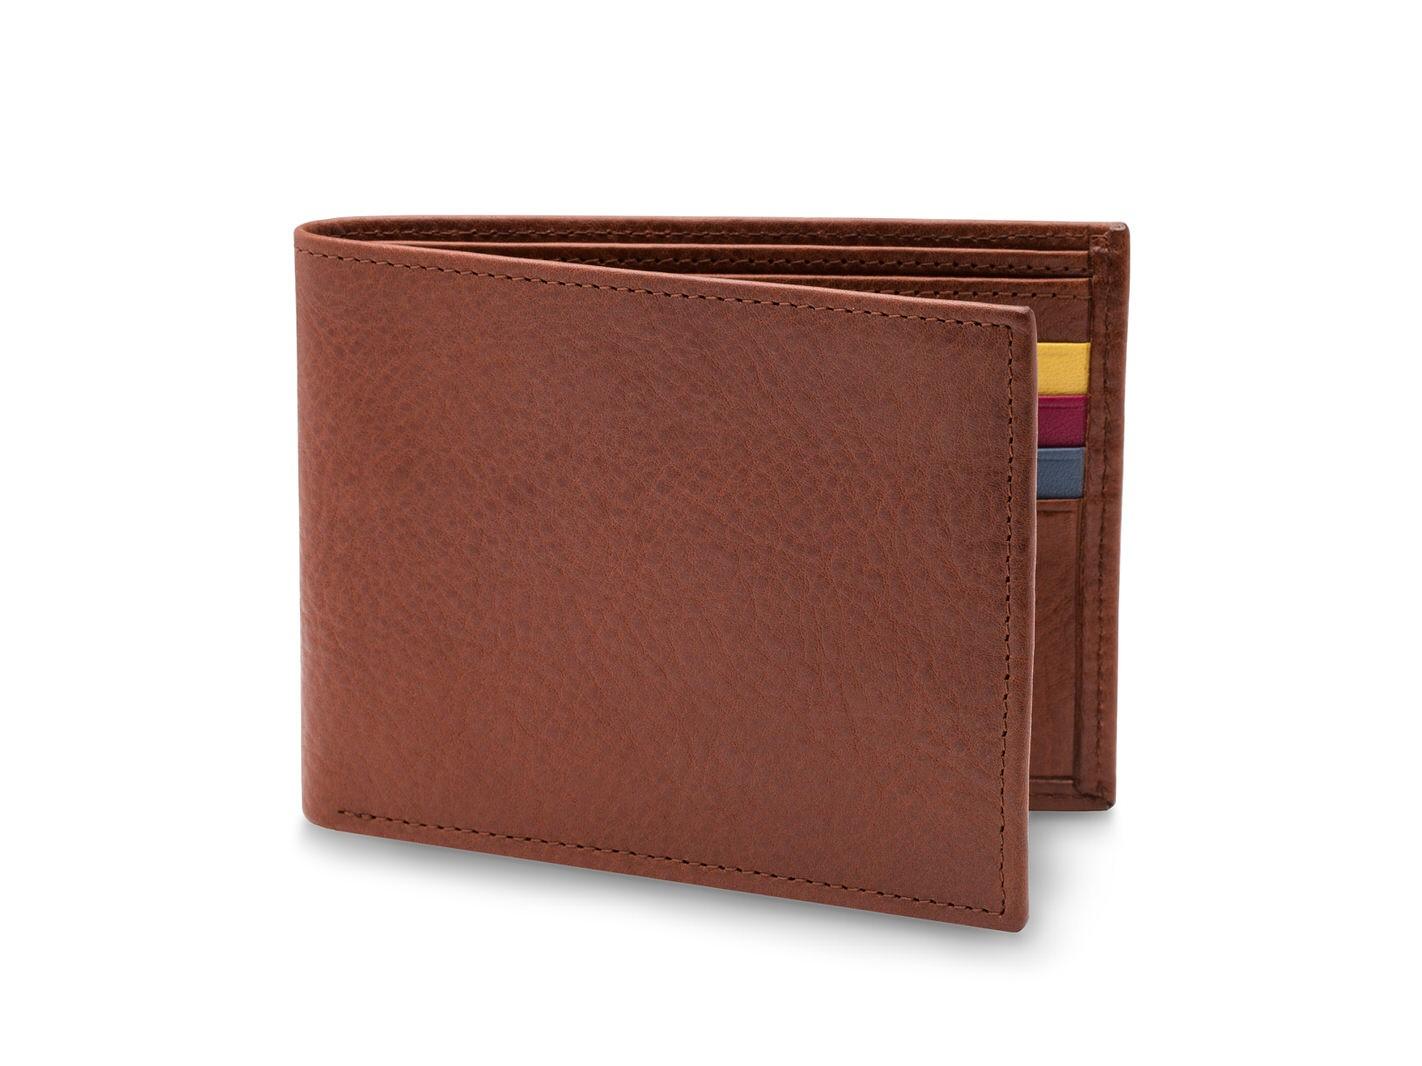 8 Pocket Deluxe Executive Wallet